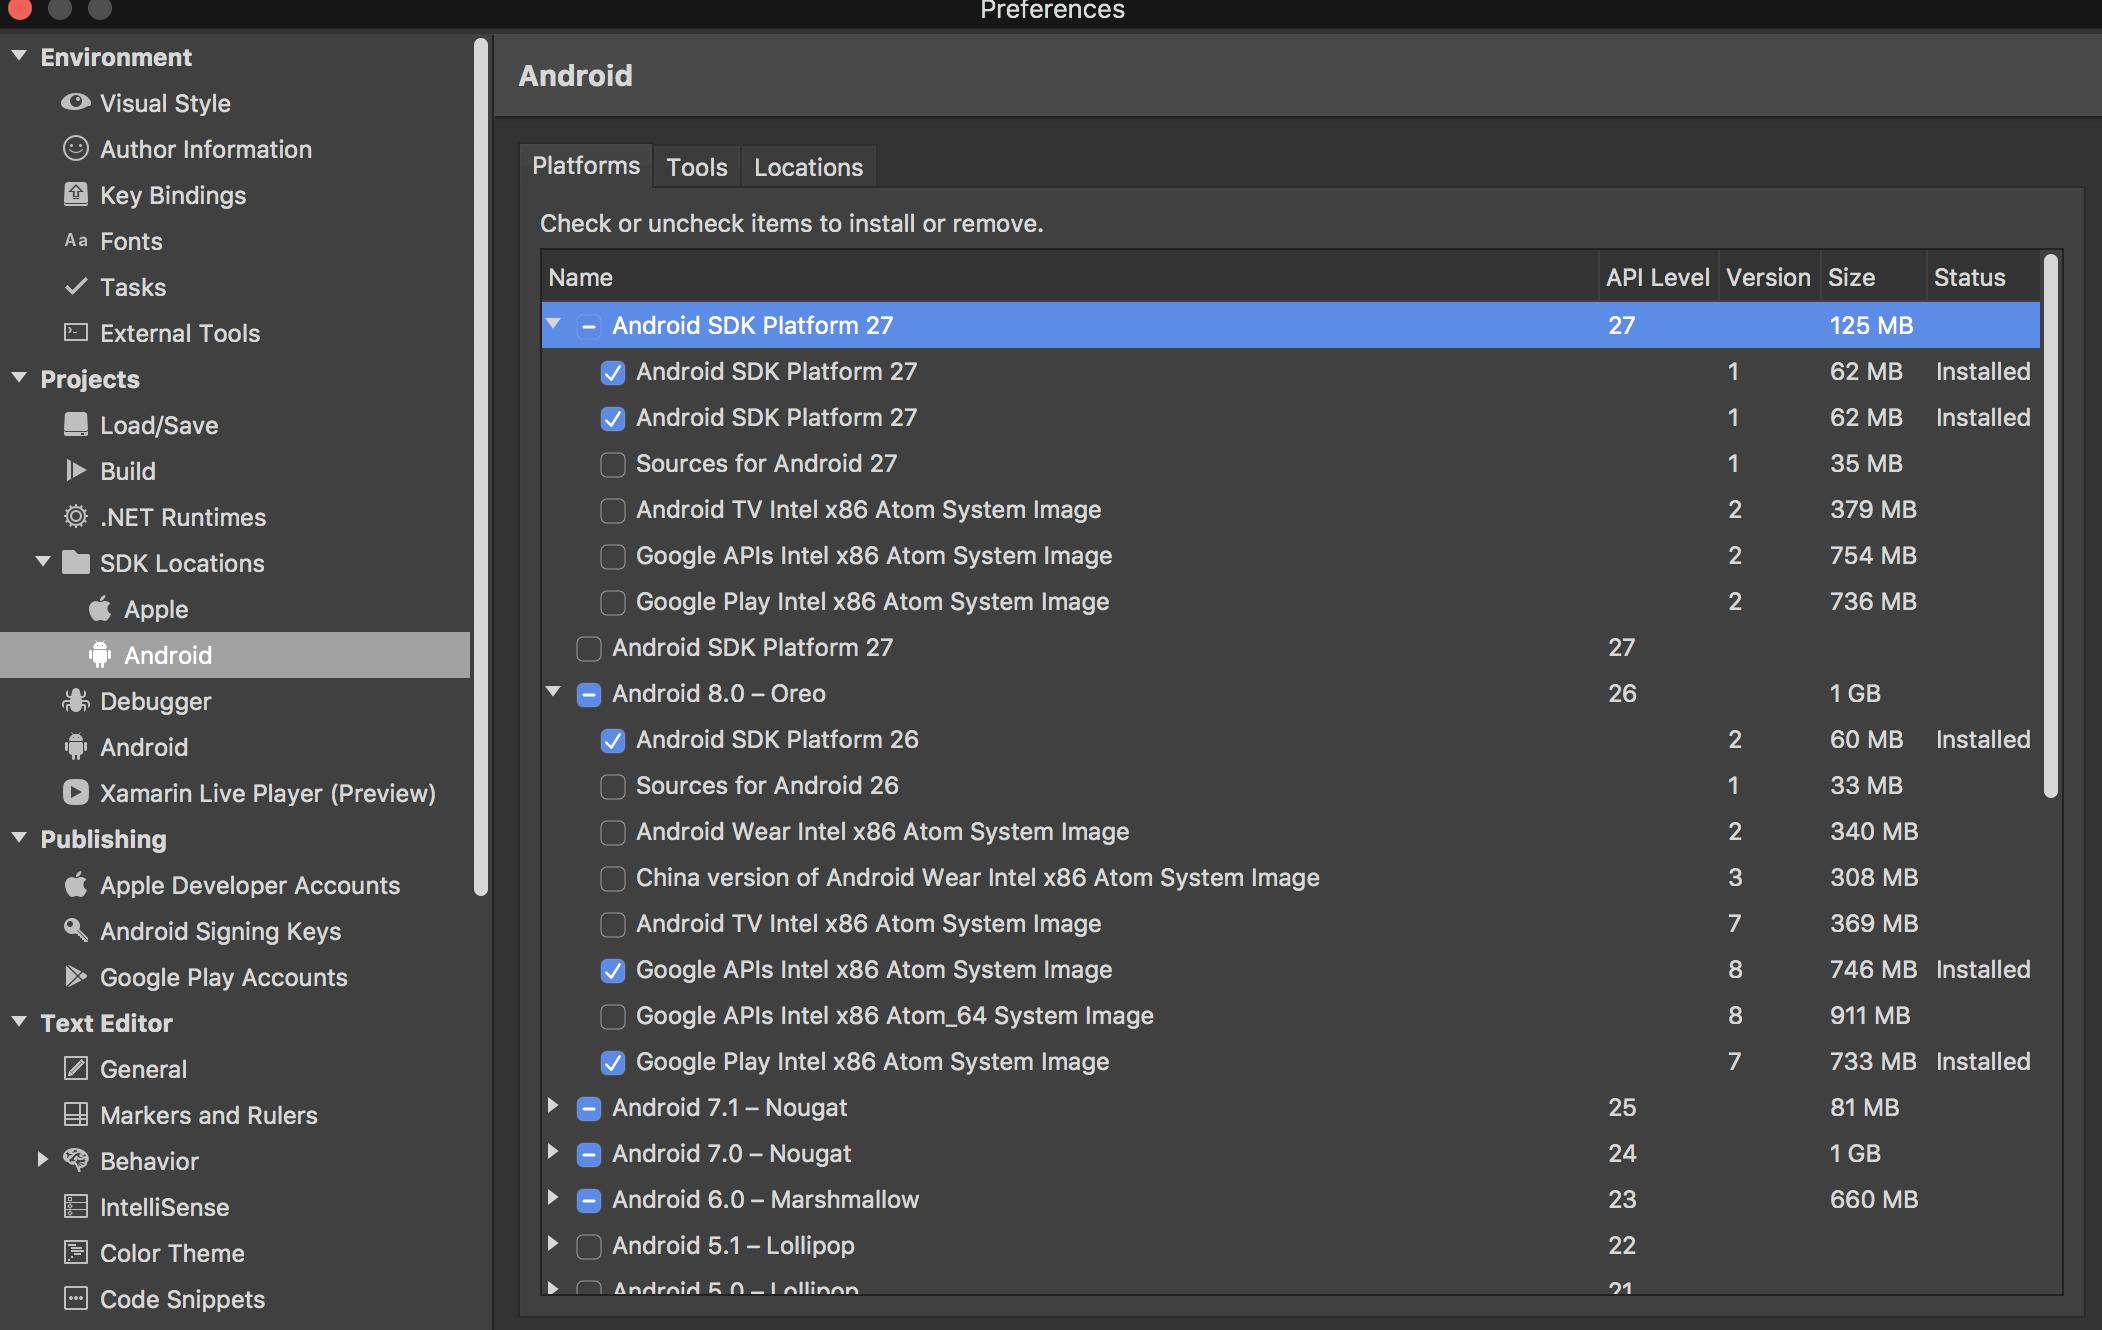 emulator error x86 emulation currently requires hardware acceleration xamarin